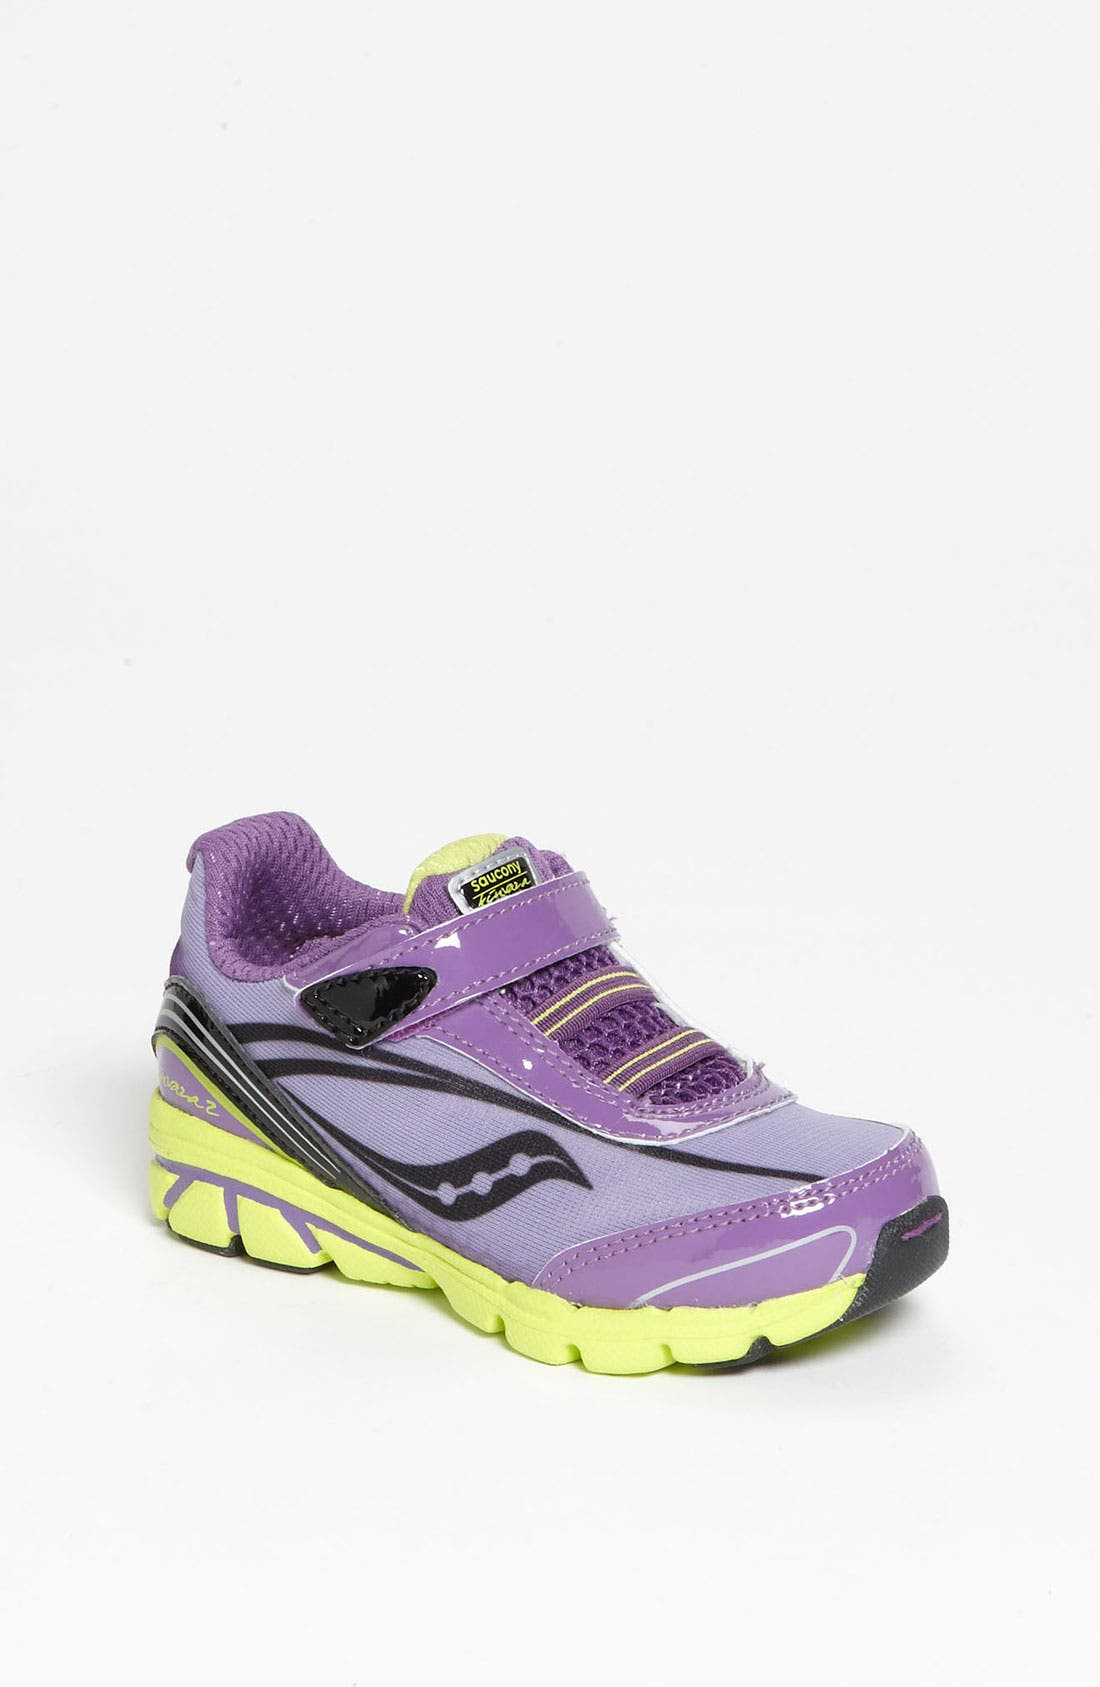 Main Image - Saucony 'Kinvara 2' Athletic Shoe (Baby, Walker & Toddler)